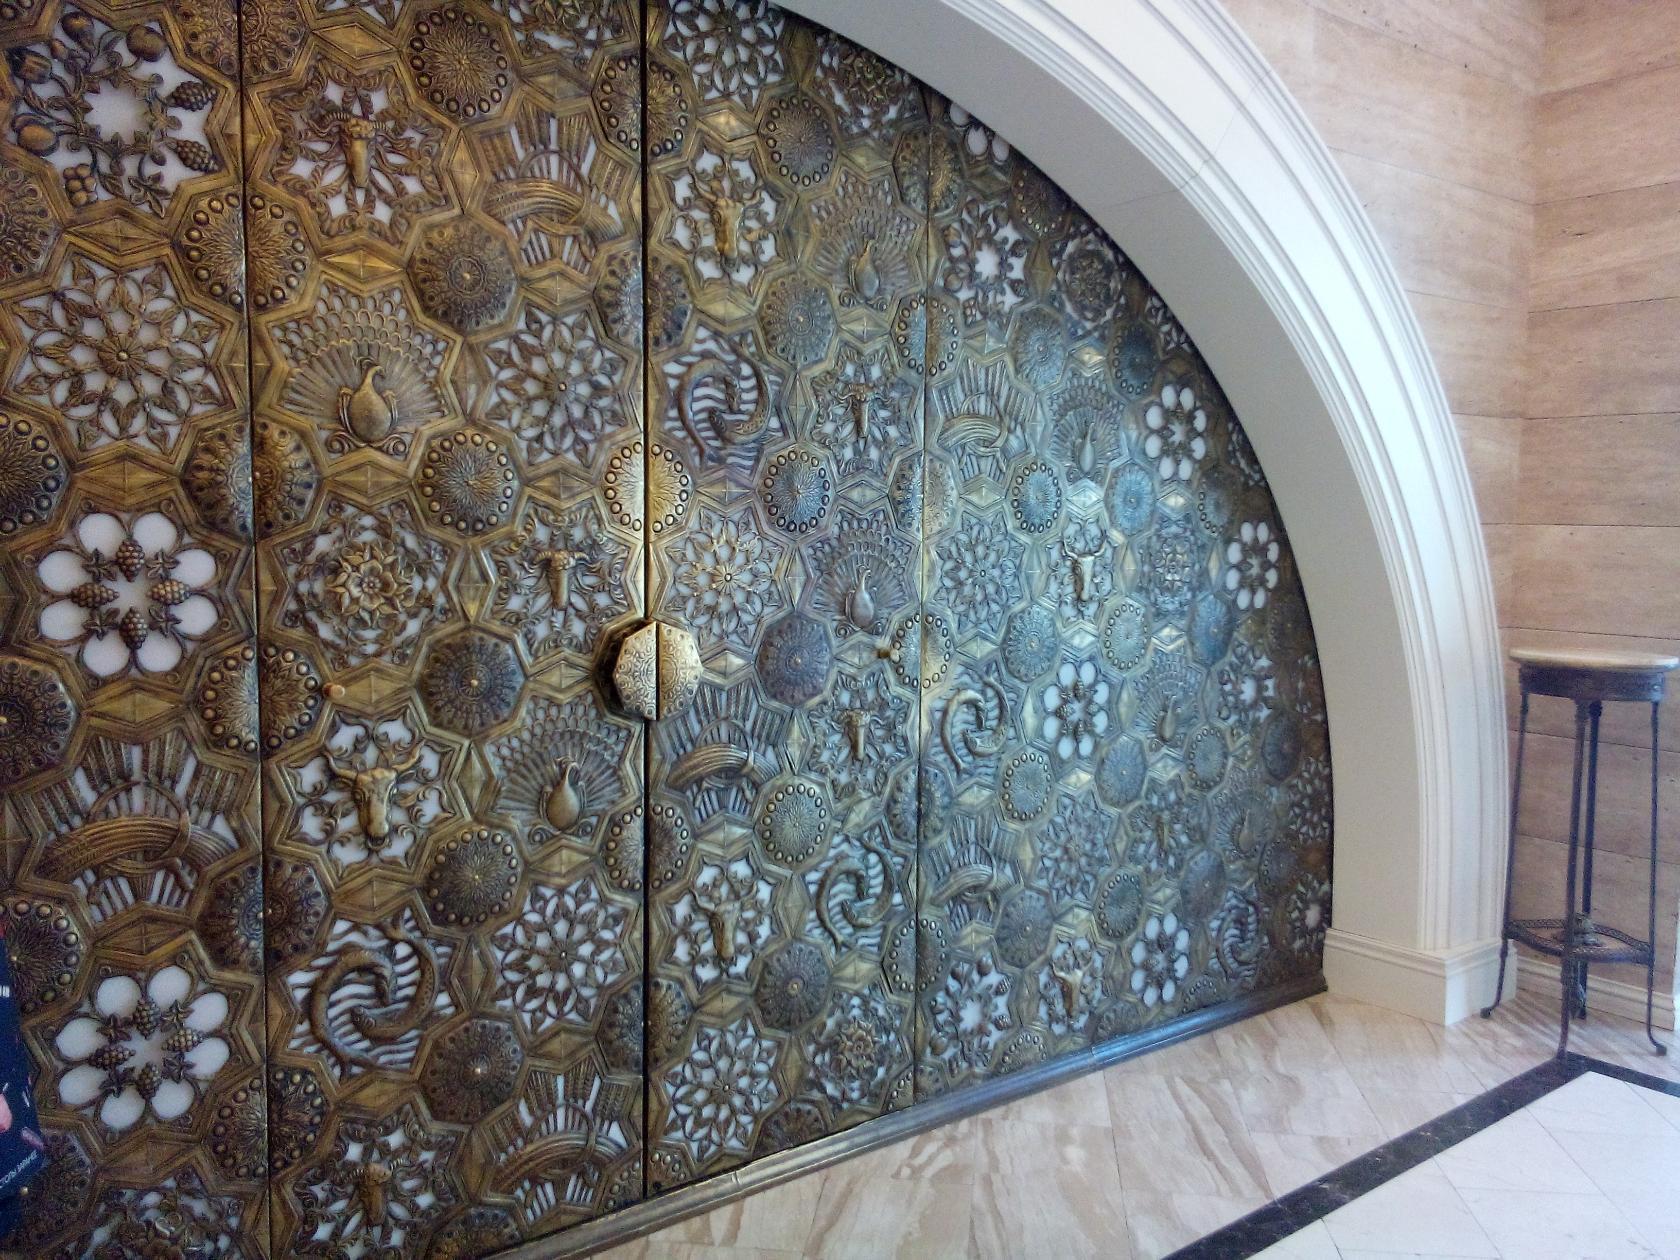 Ажур в ресторане Арагви. Блиц: арки и ворота